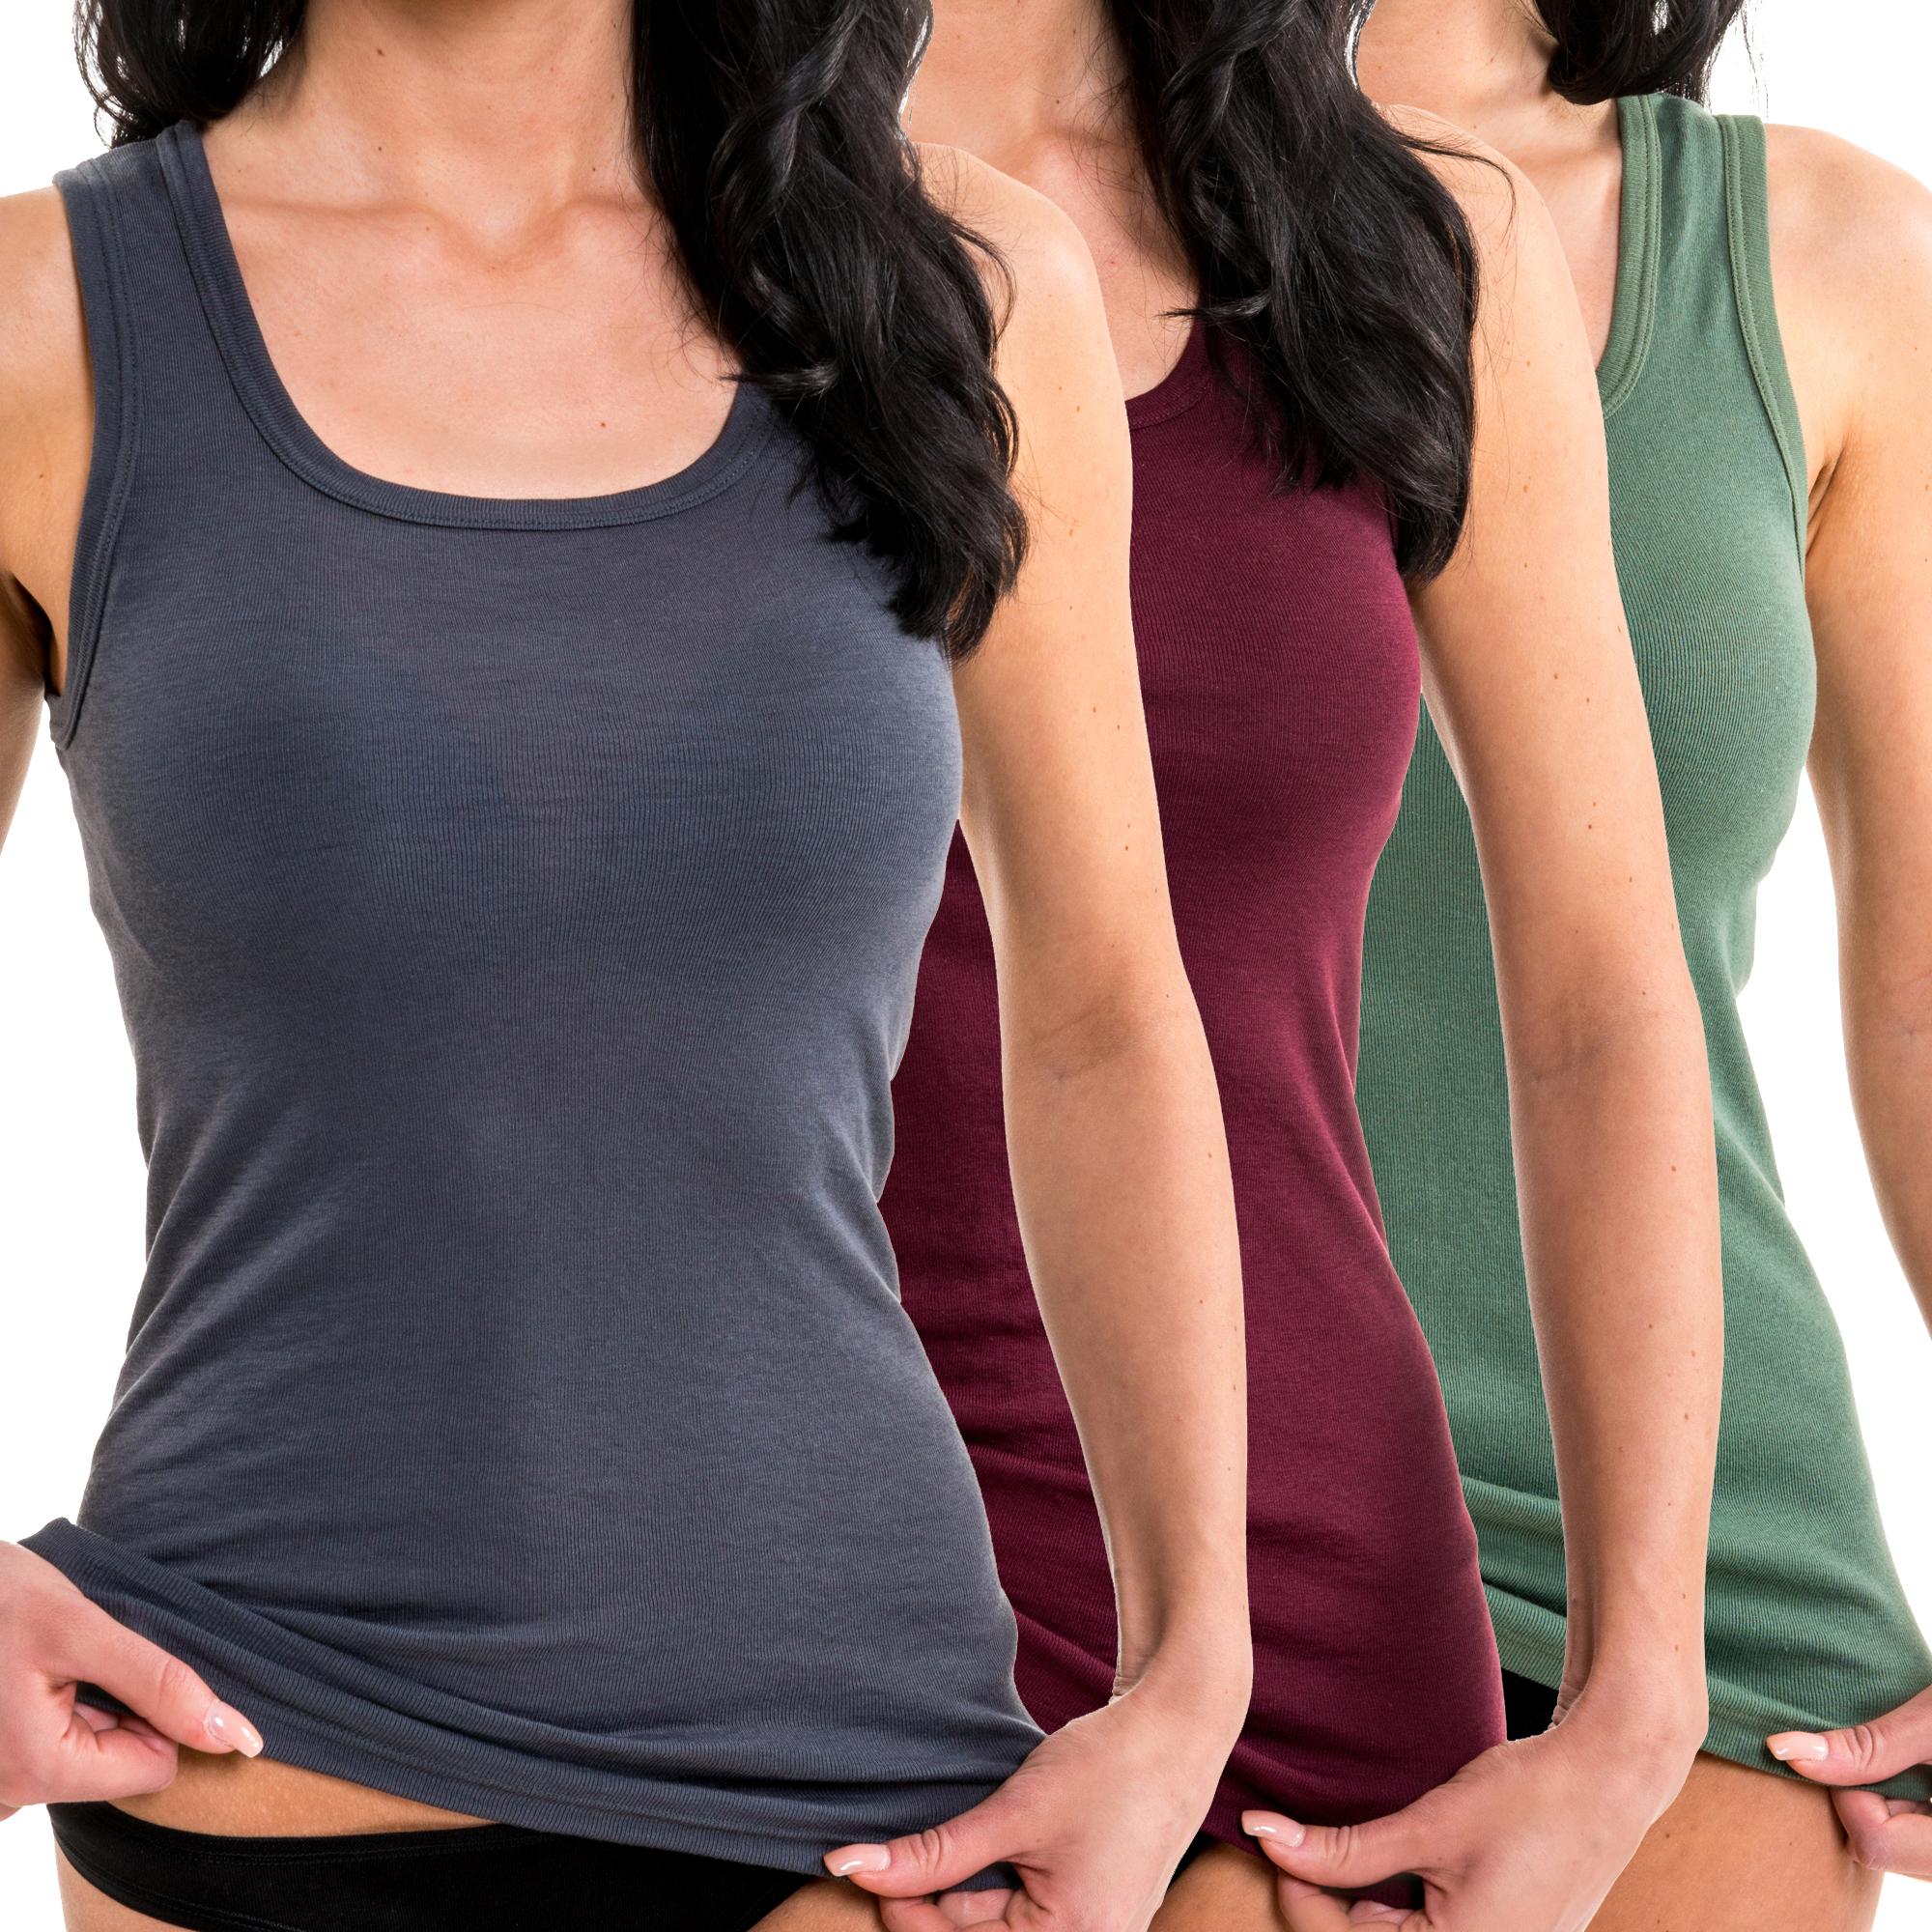 HERMKO 61325 Damen Funktions-Longshirt ideal f/ür Sport